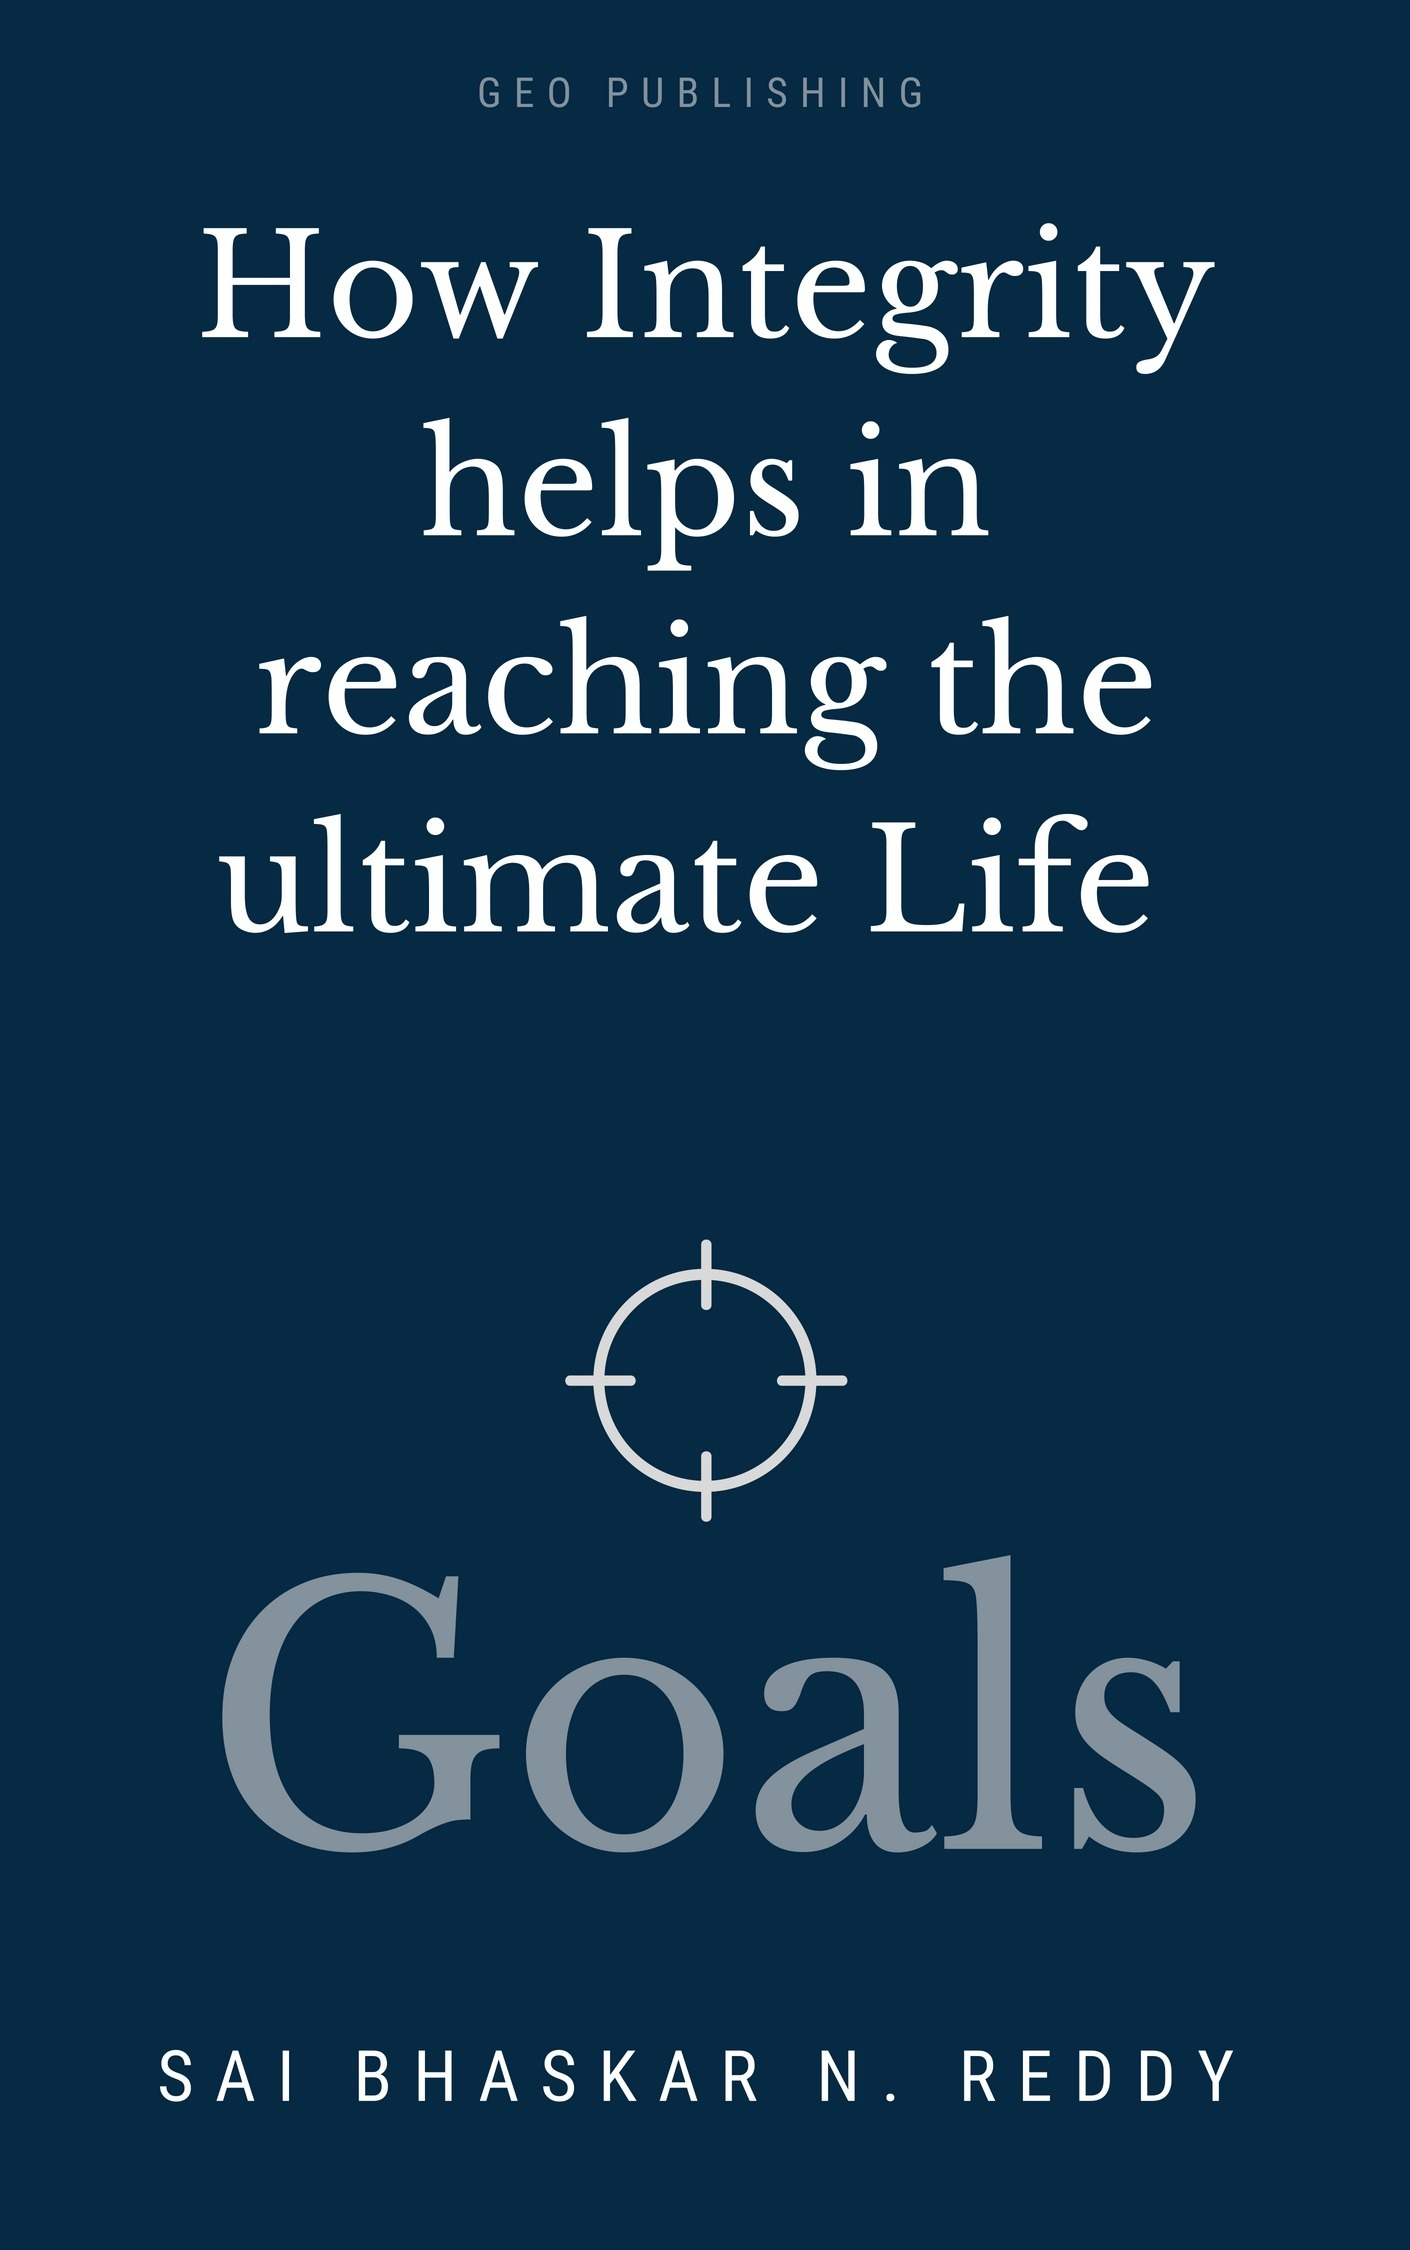 sai-bhaskar-reddy-nakka-how-integrity-helps-in-reaching-the-ultimate-life-goals